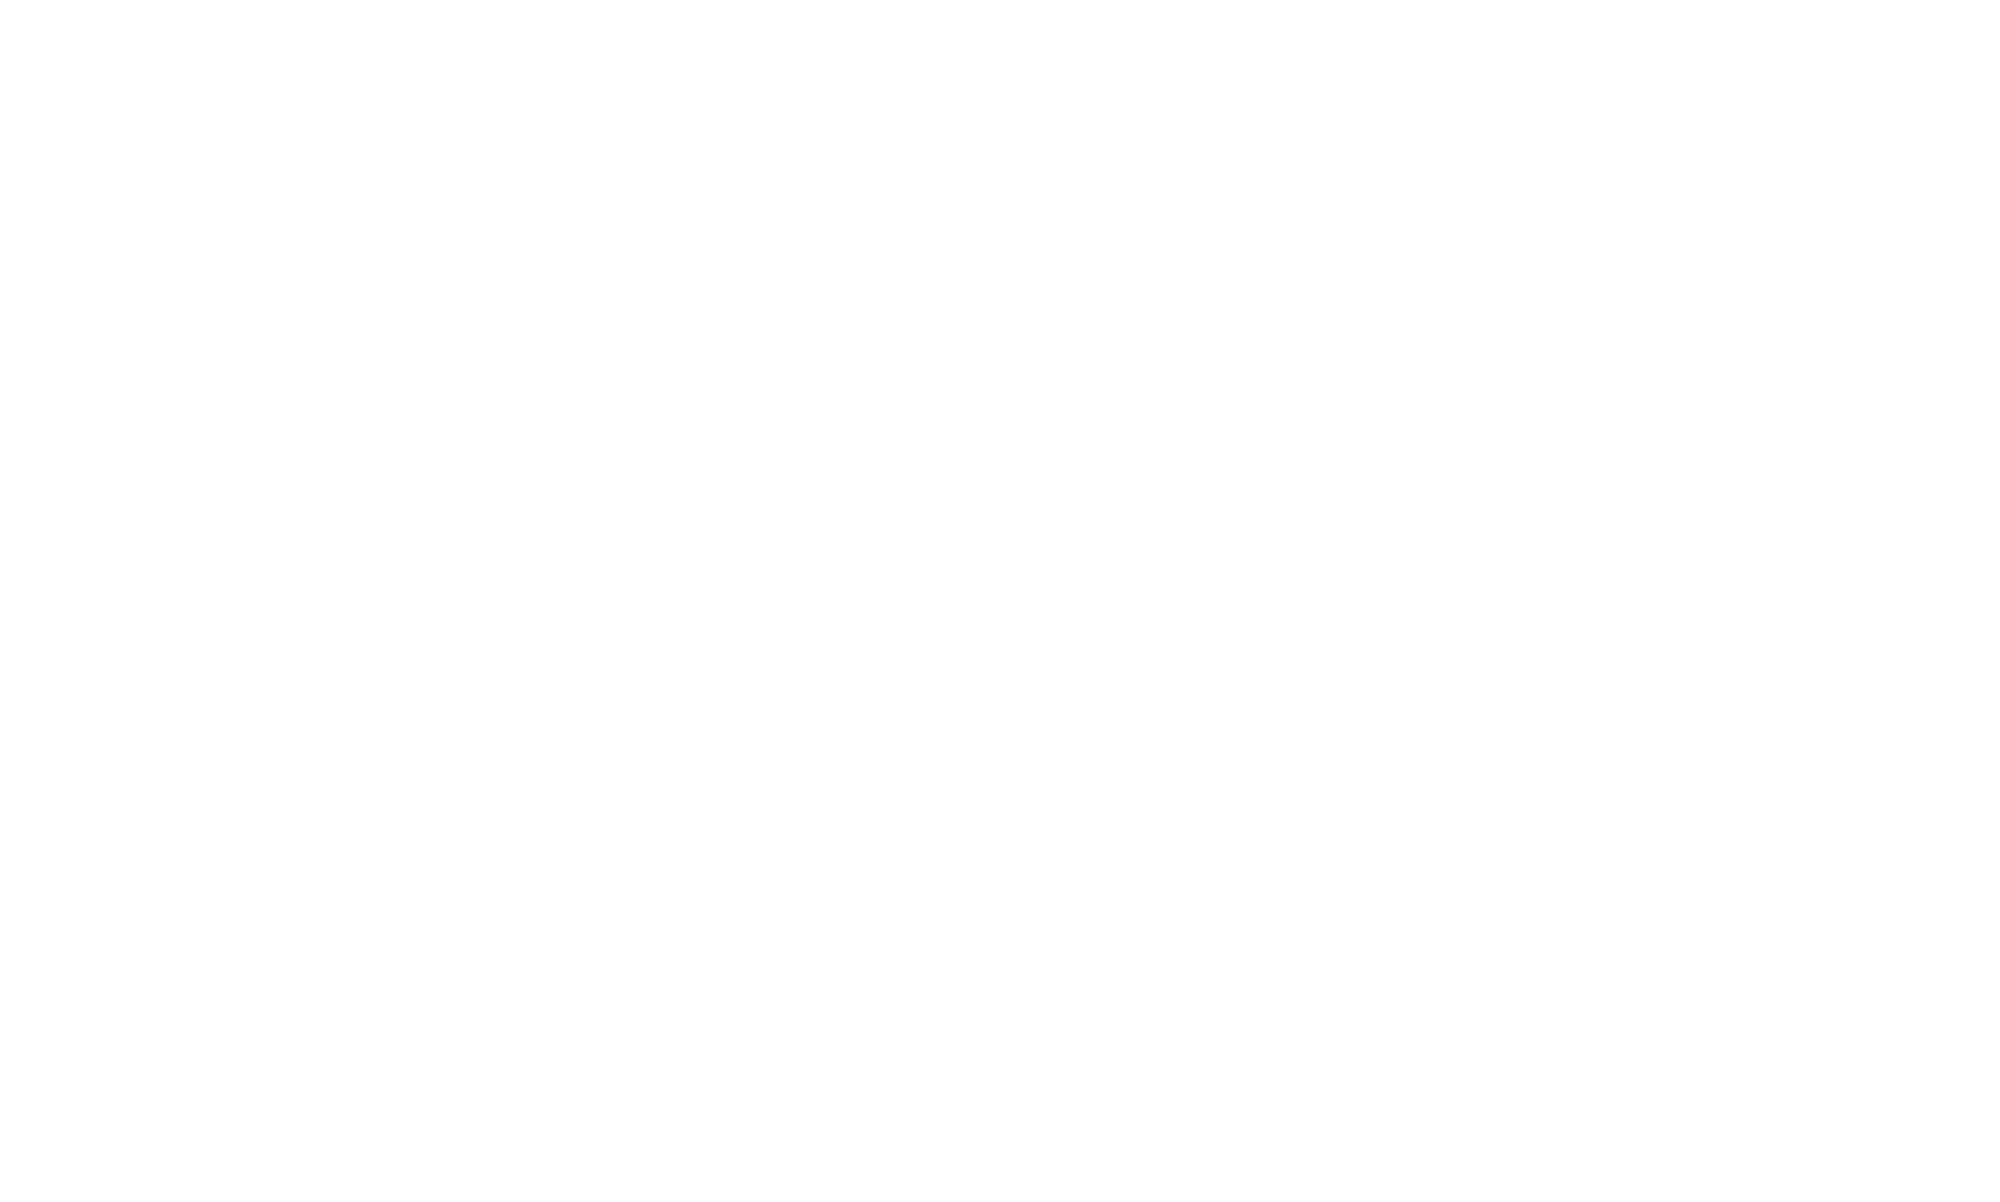 EAC logo FINAL WHITE transparentbkrnd-LARGE.png